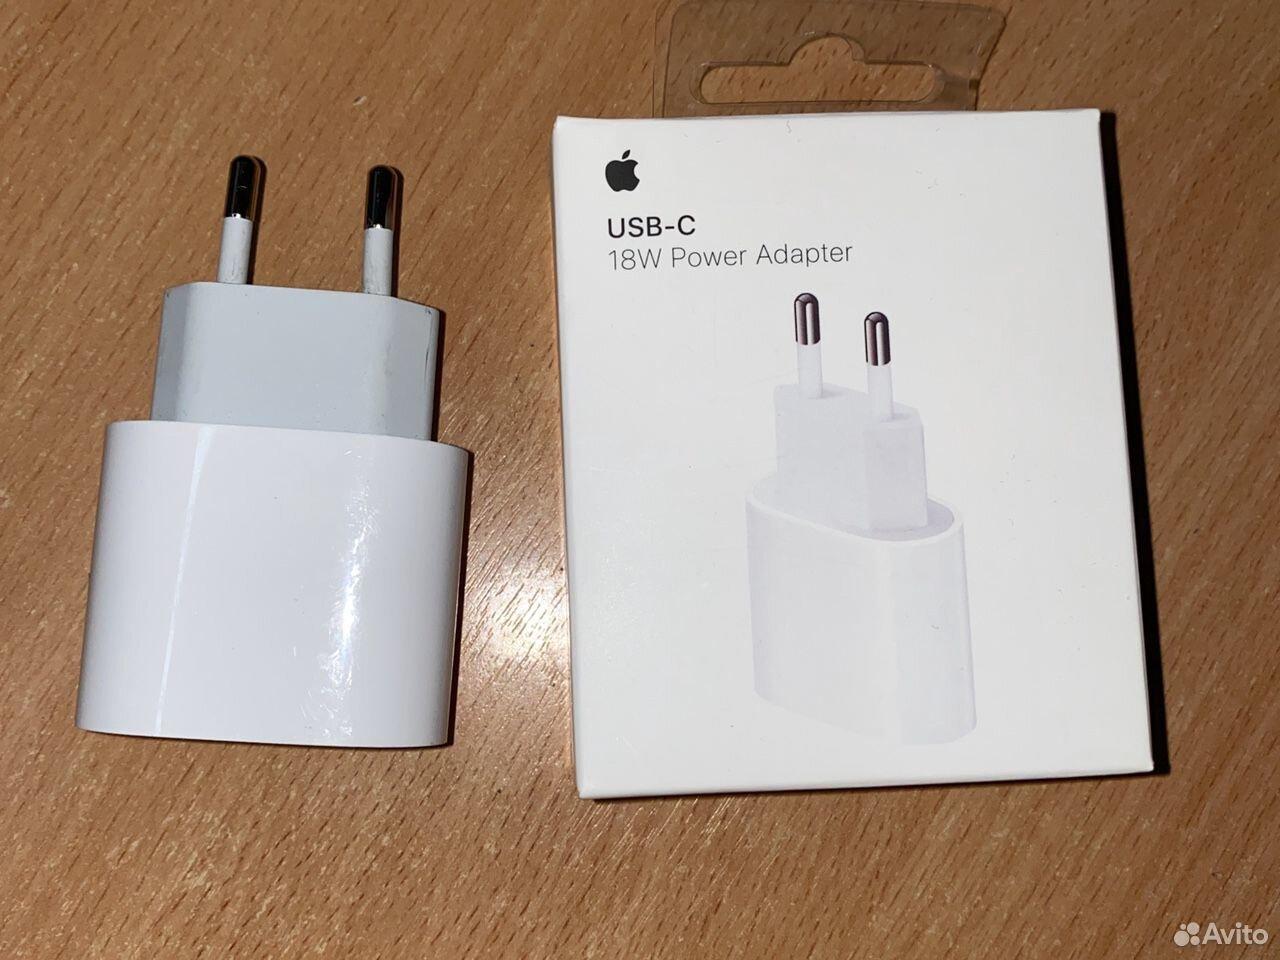 Блочок зарядки 18w power Adapter USB-C